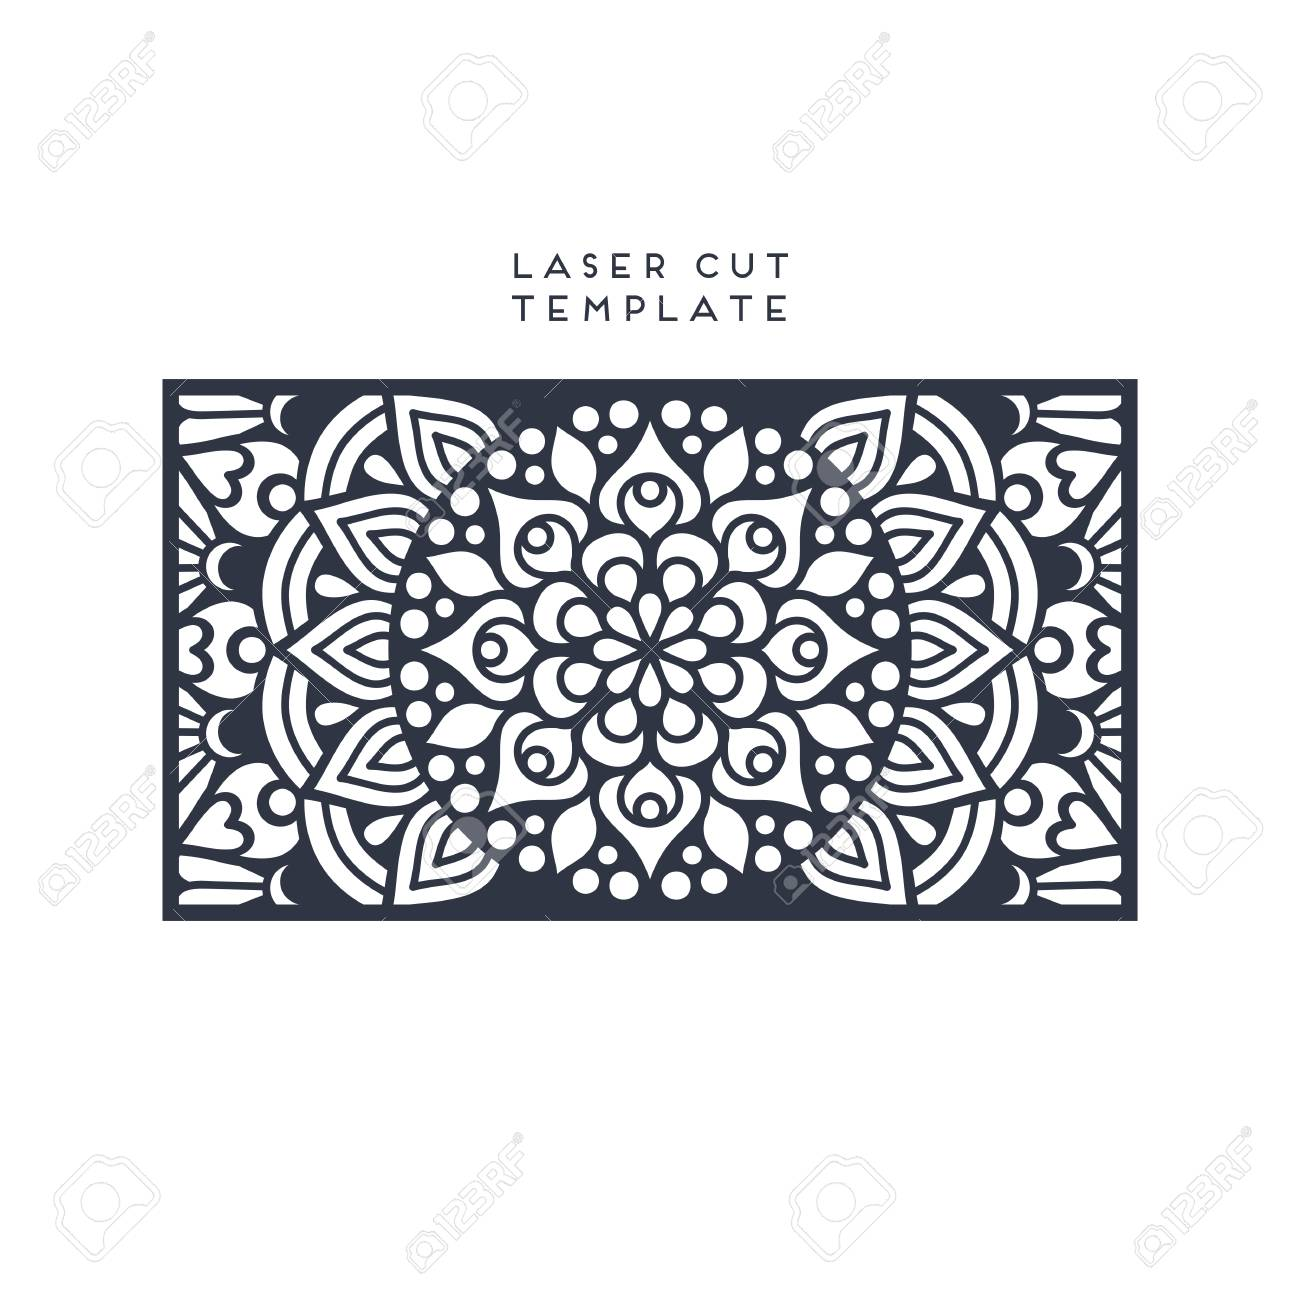 vector vector wedding card laser cut template vintage decorative elements design - Free Laser Cutter Templates